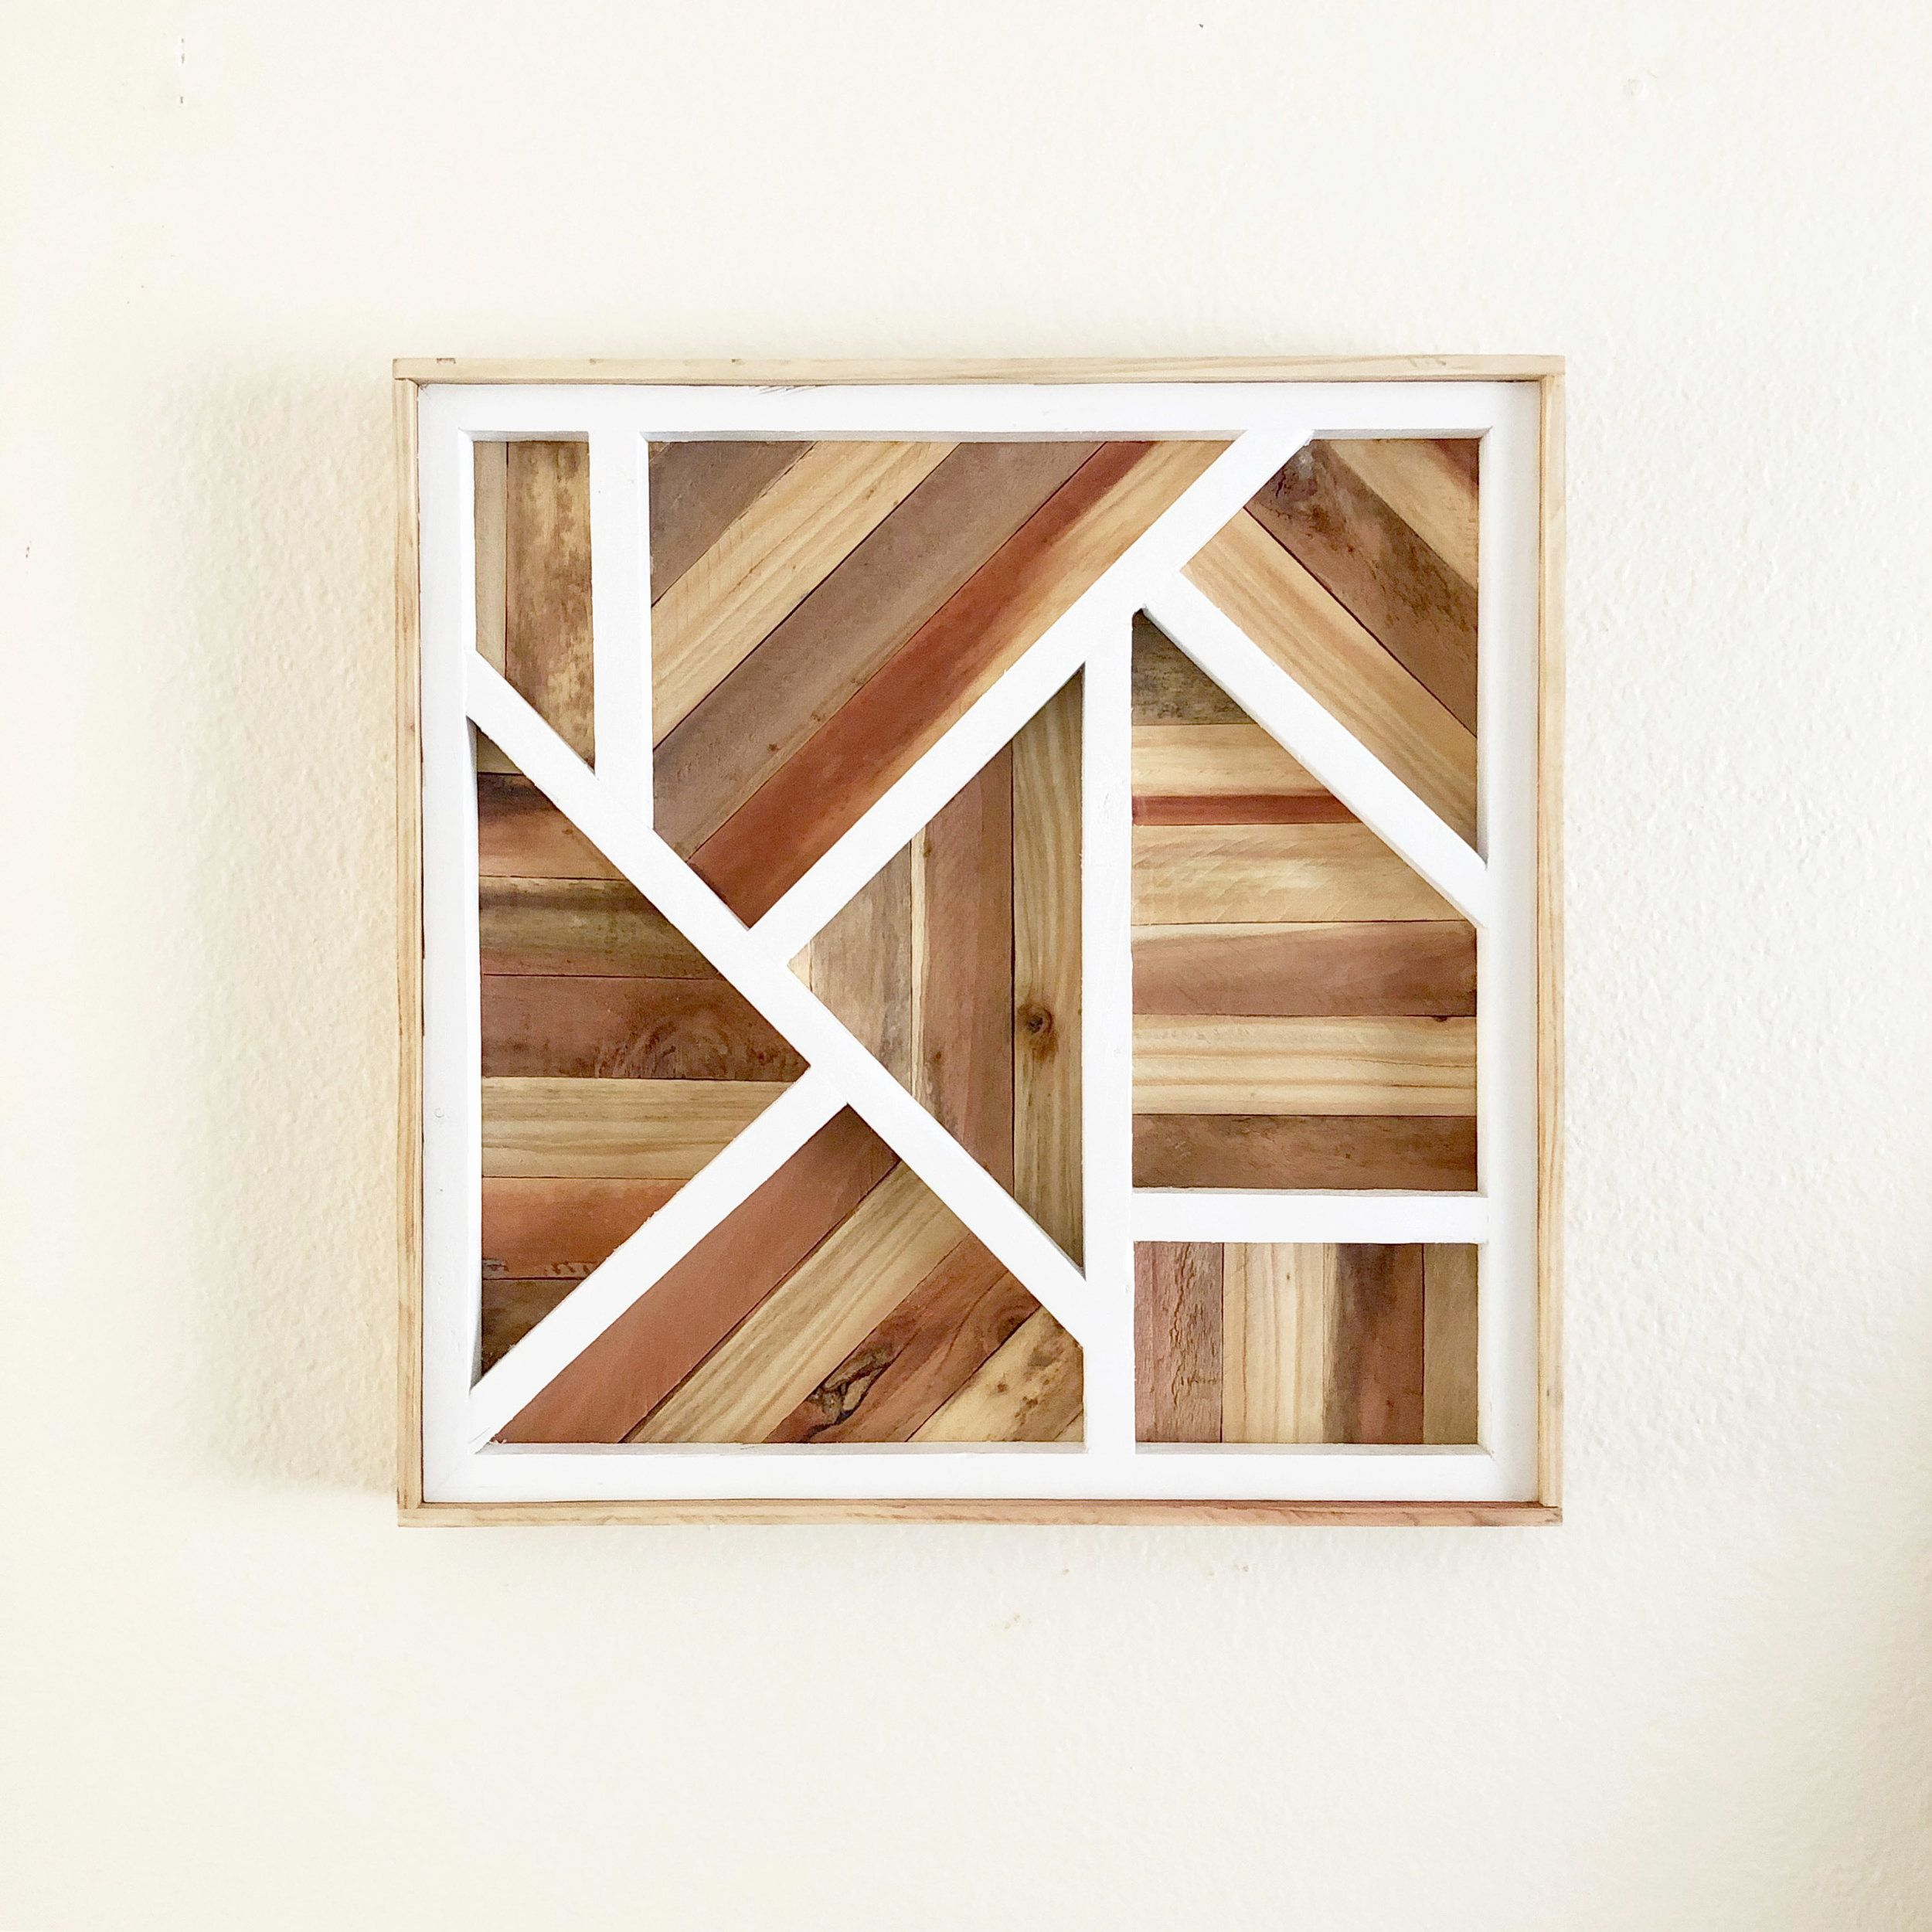 Art Deco Inspired Rustic Lath Wood Artwork White Tipsy Oak Wood Wall Art Wood Art Rustic Wall Art